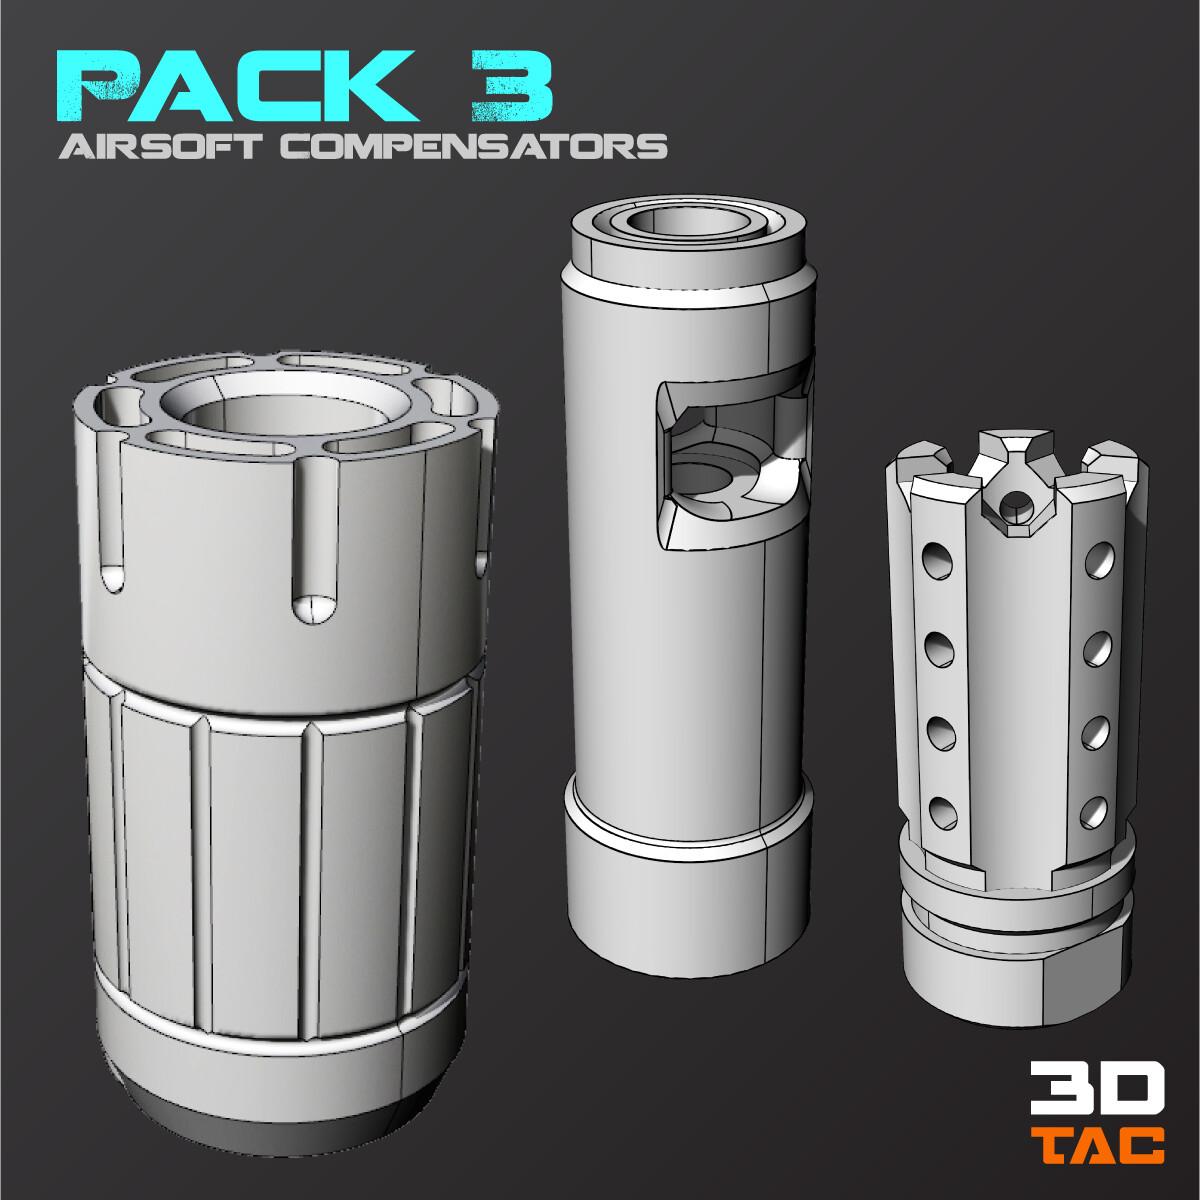 Paquete Compensadores 3 / Archivos 3D